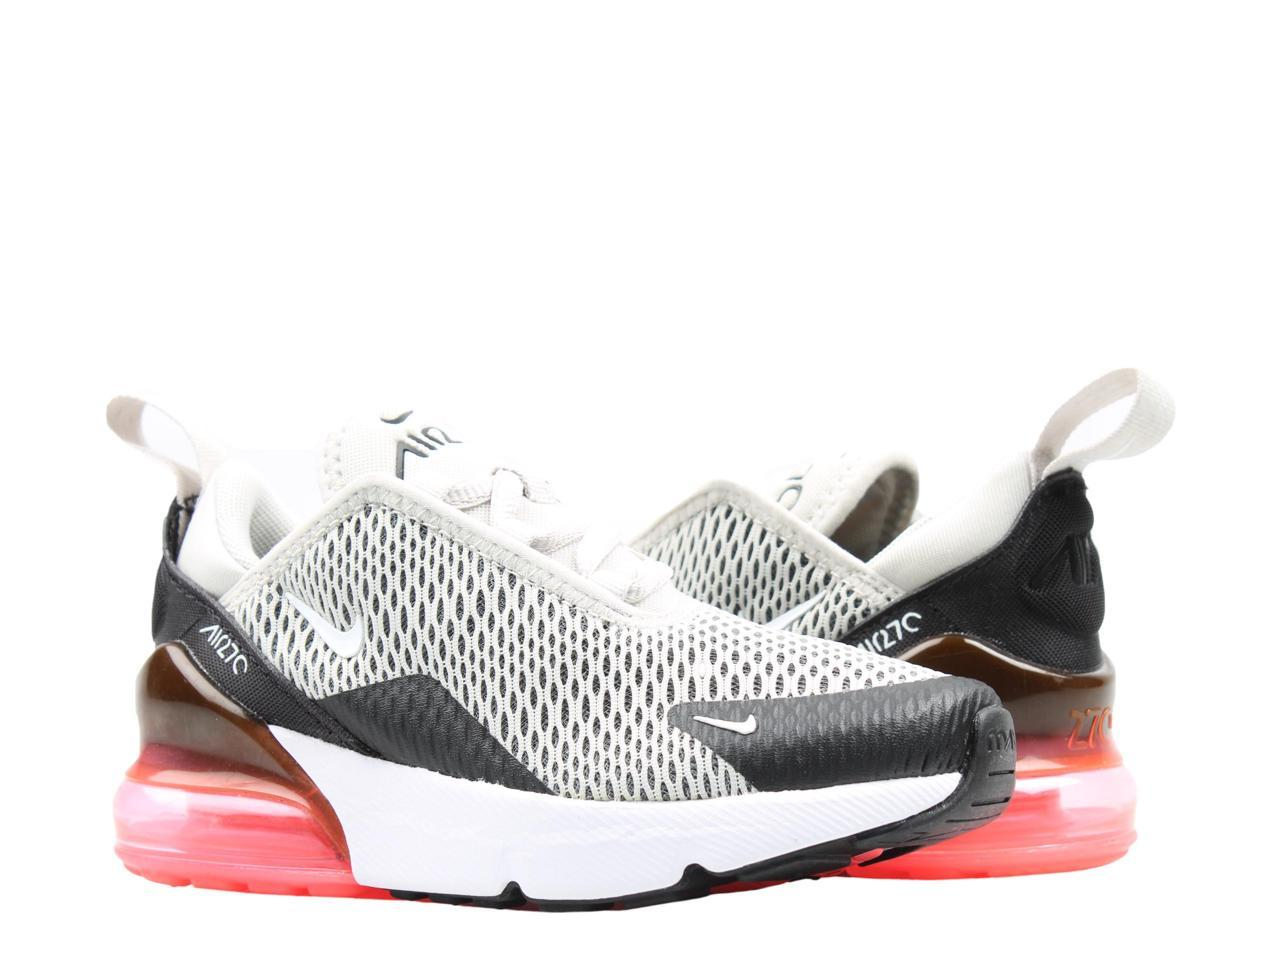 Nike Air Max 270 (PS) Light Bone/White